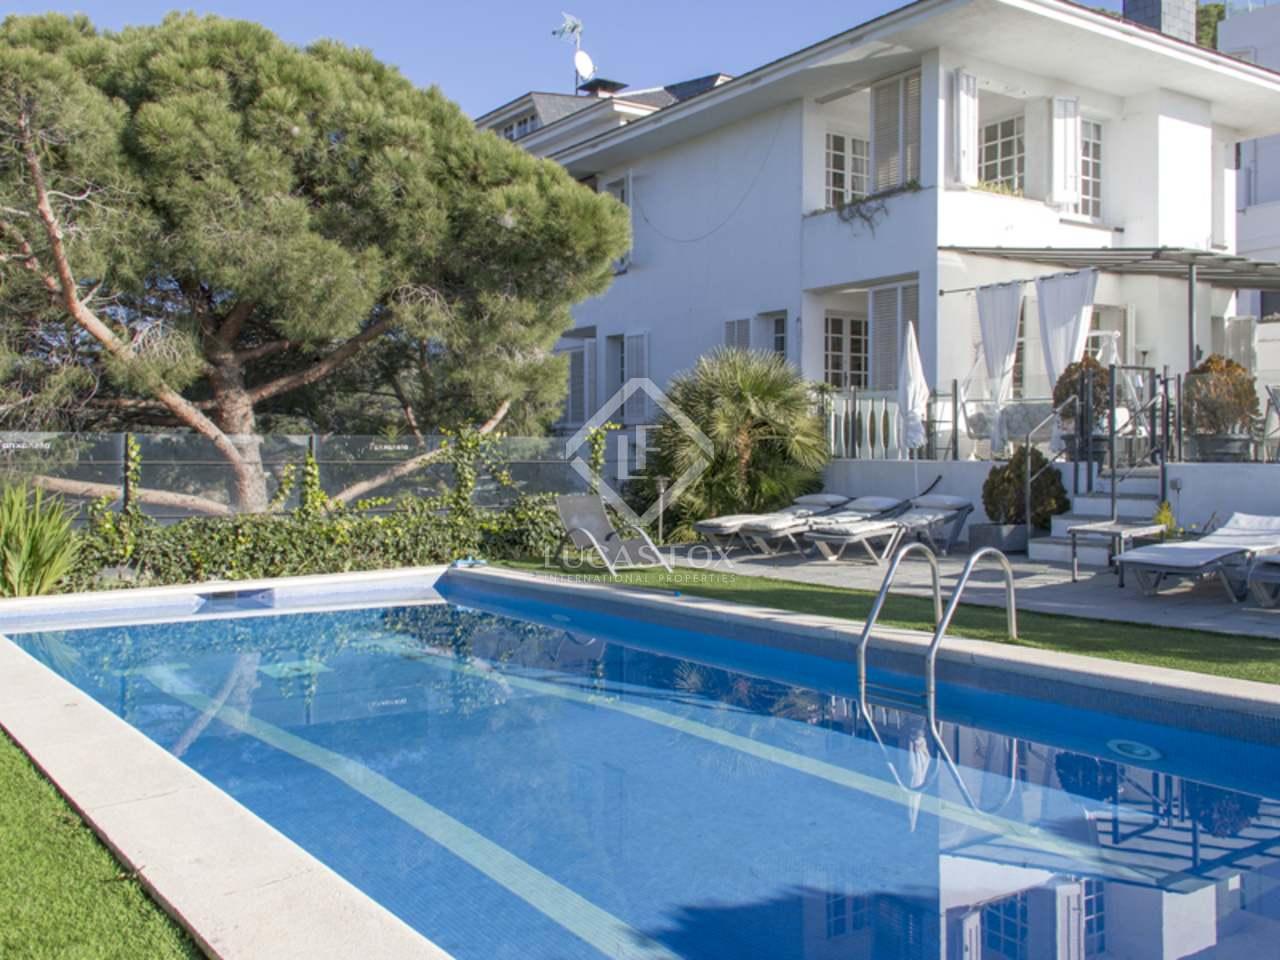 Casa en venta en arenys de munt maresme barcelona - Casa arenys de munt ...